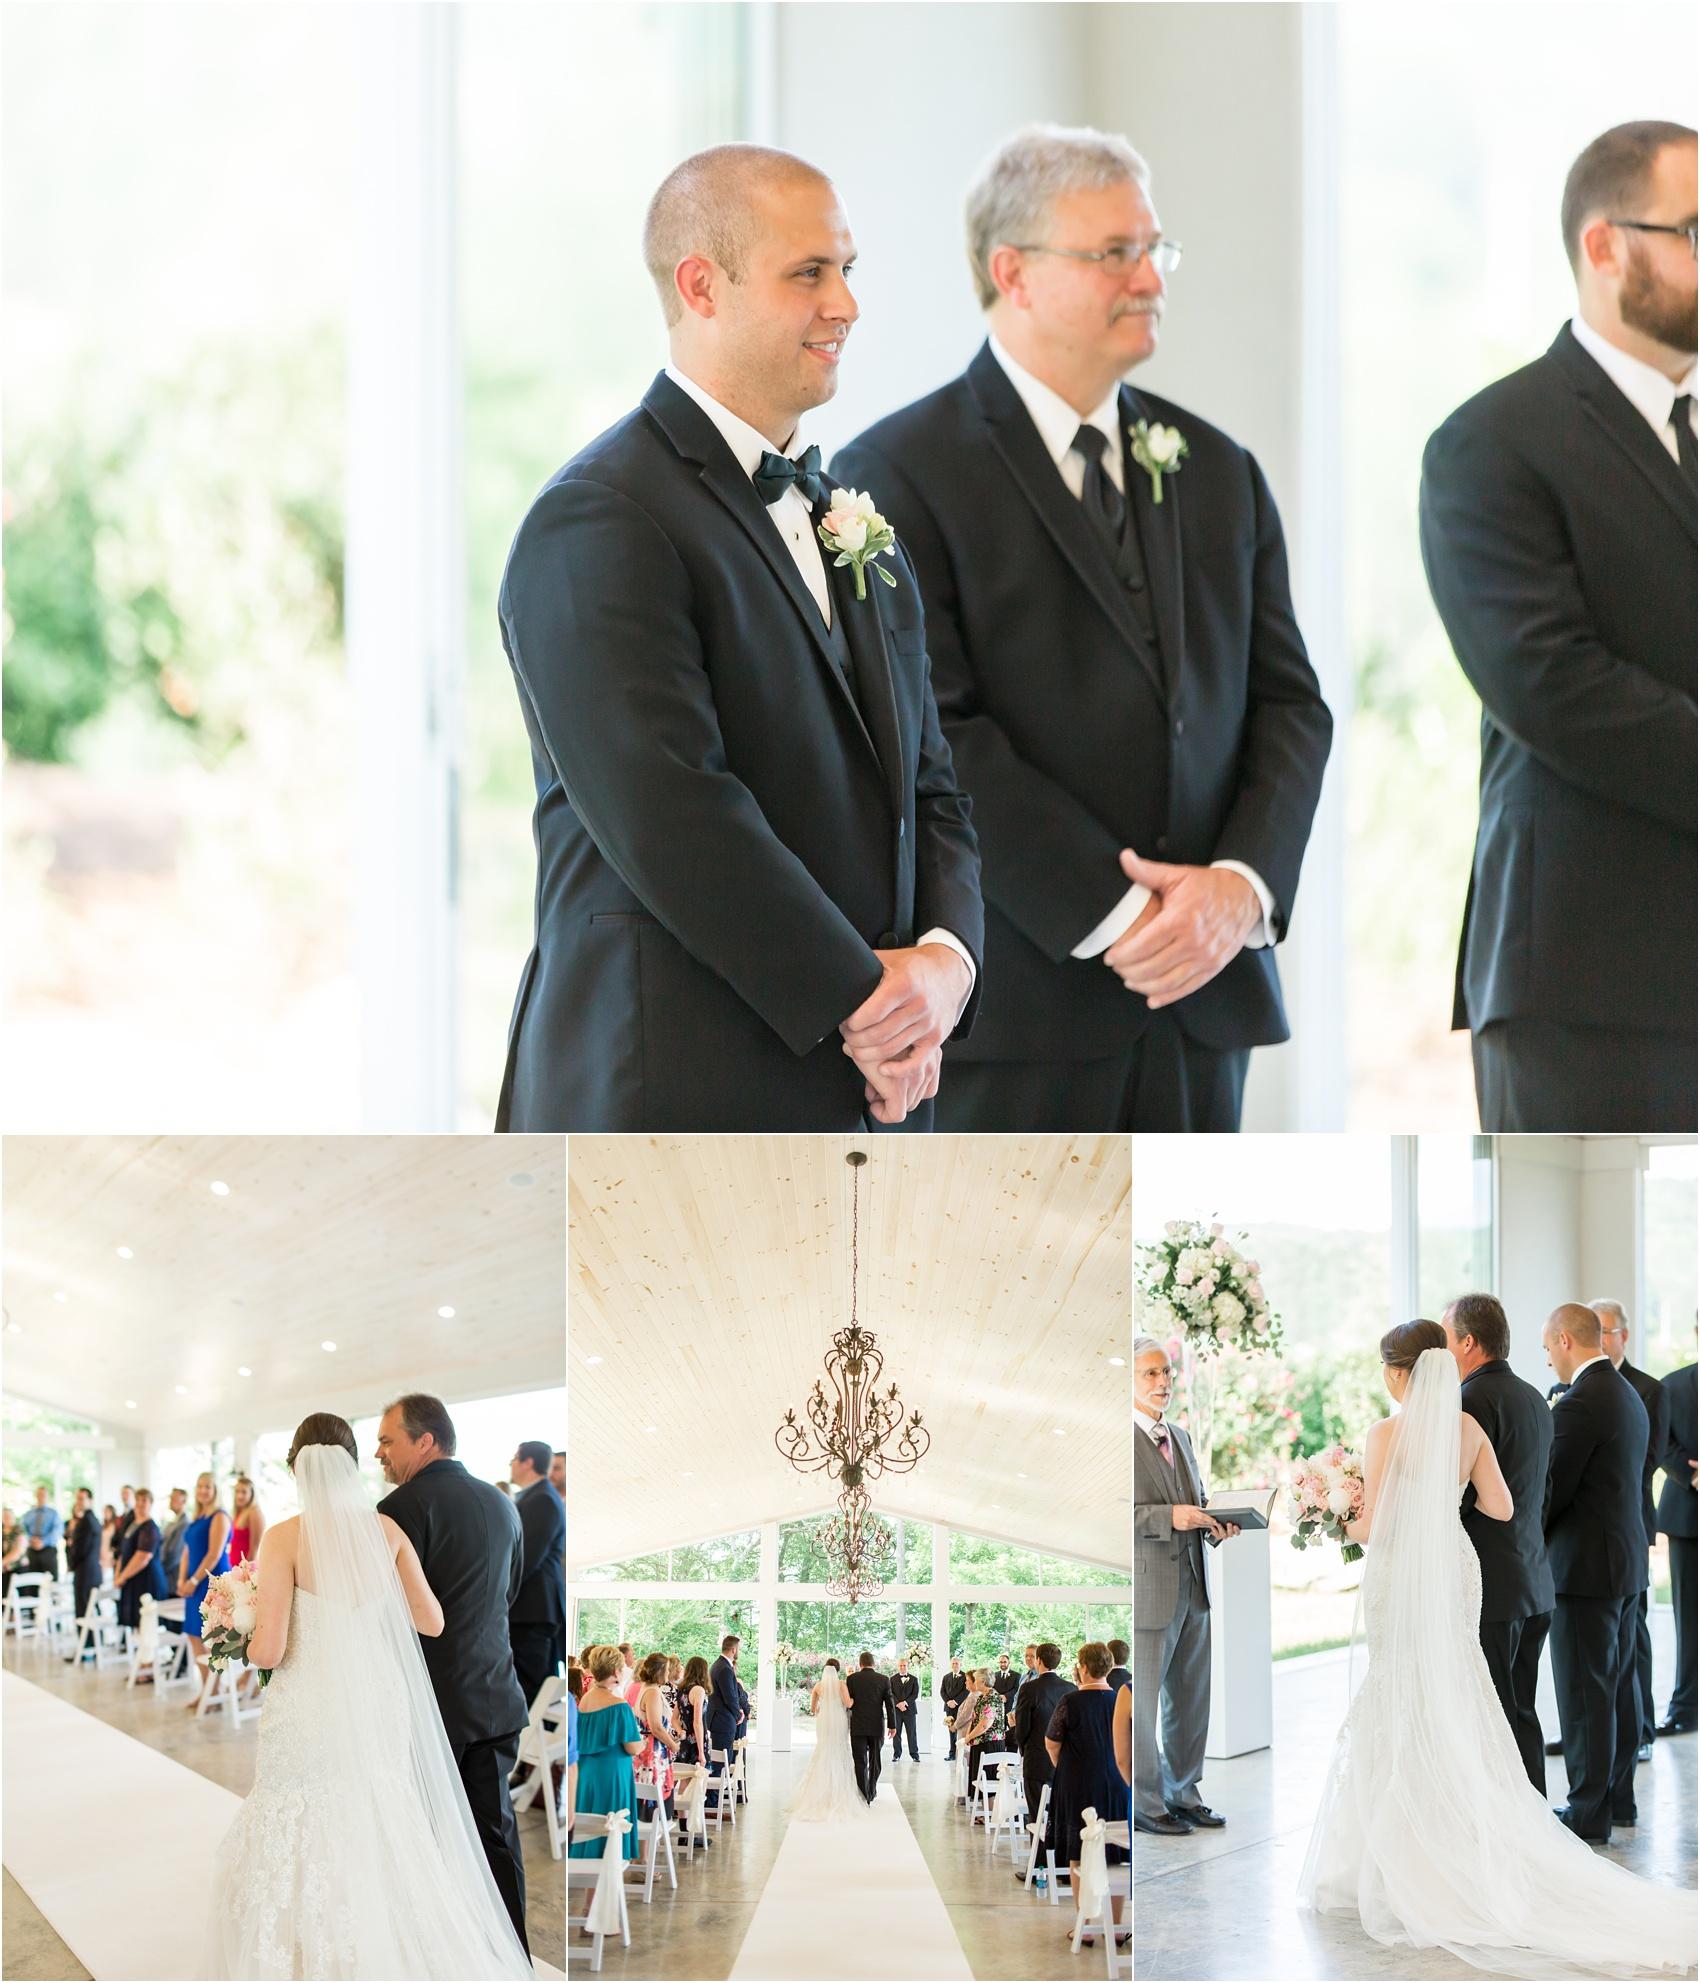 Savannah Eve Photography- Nutt Wedding- Blog-66.jpg